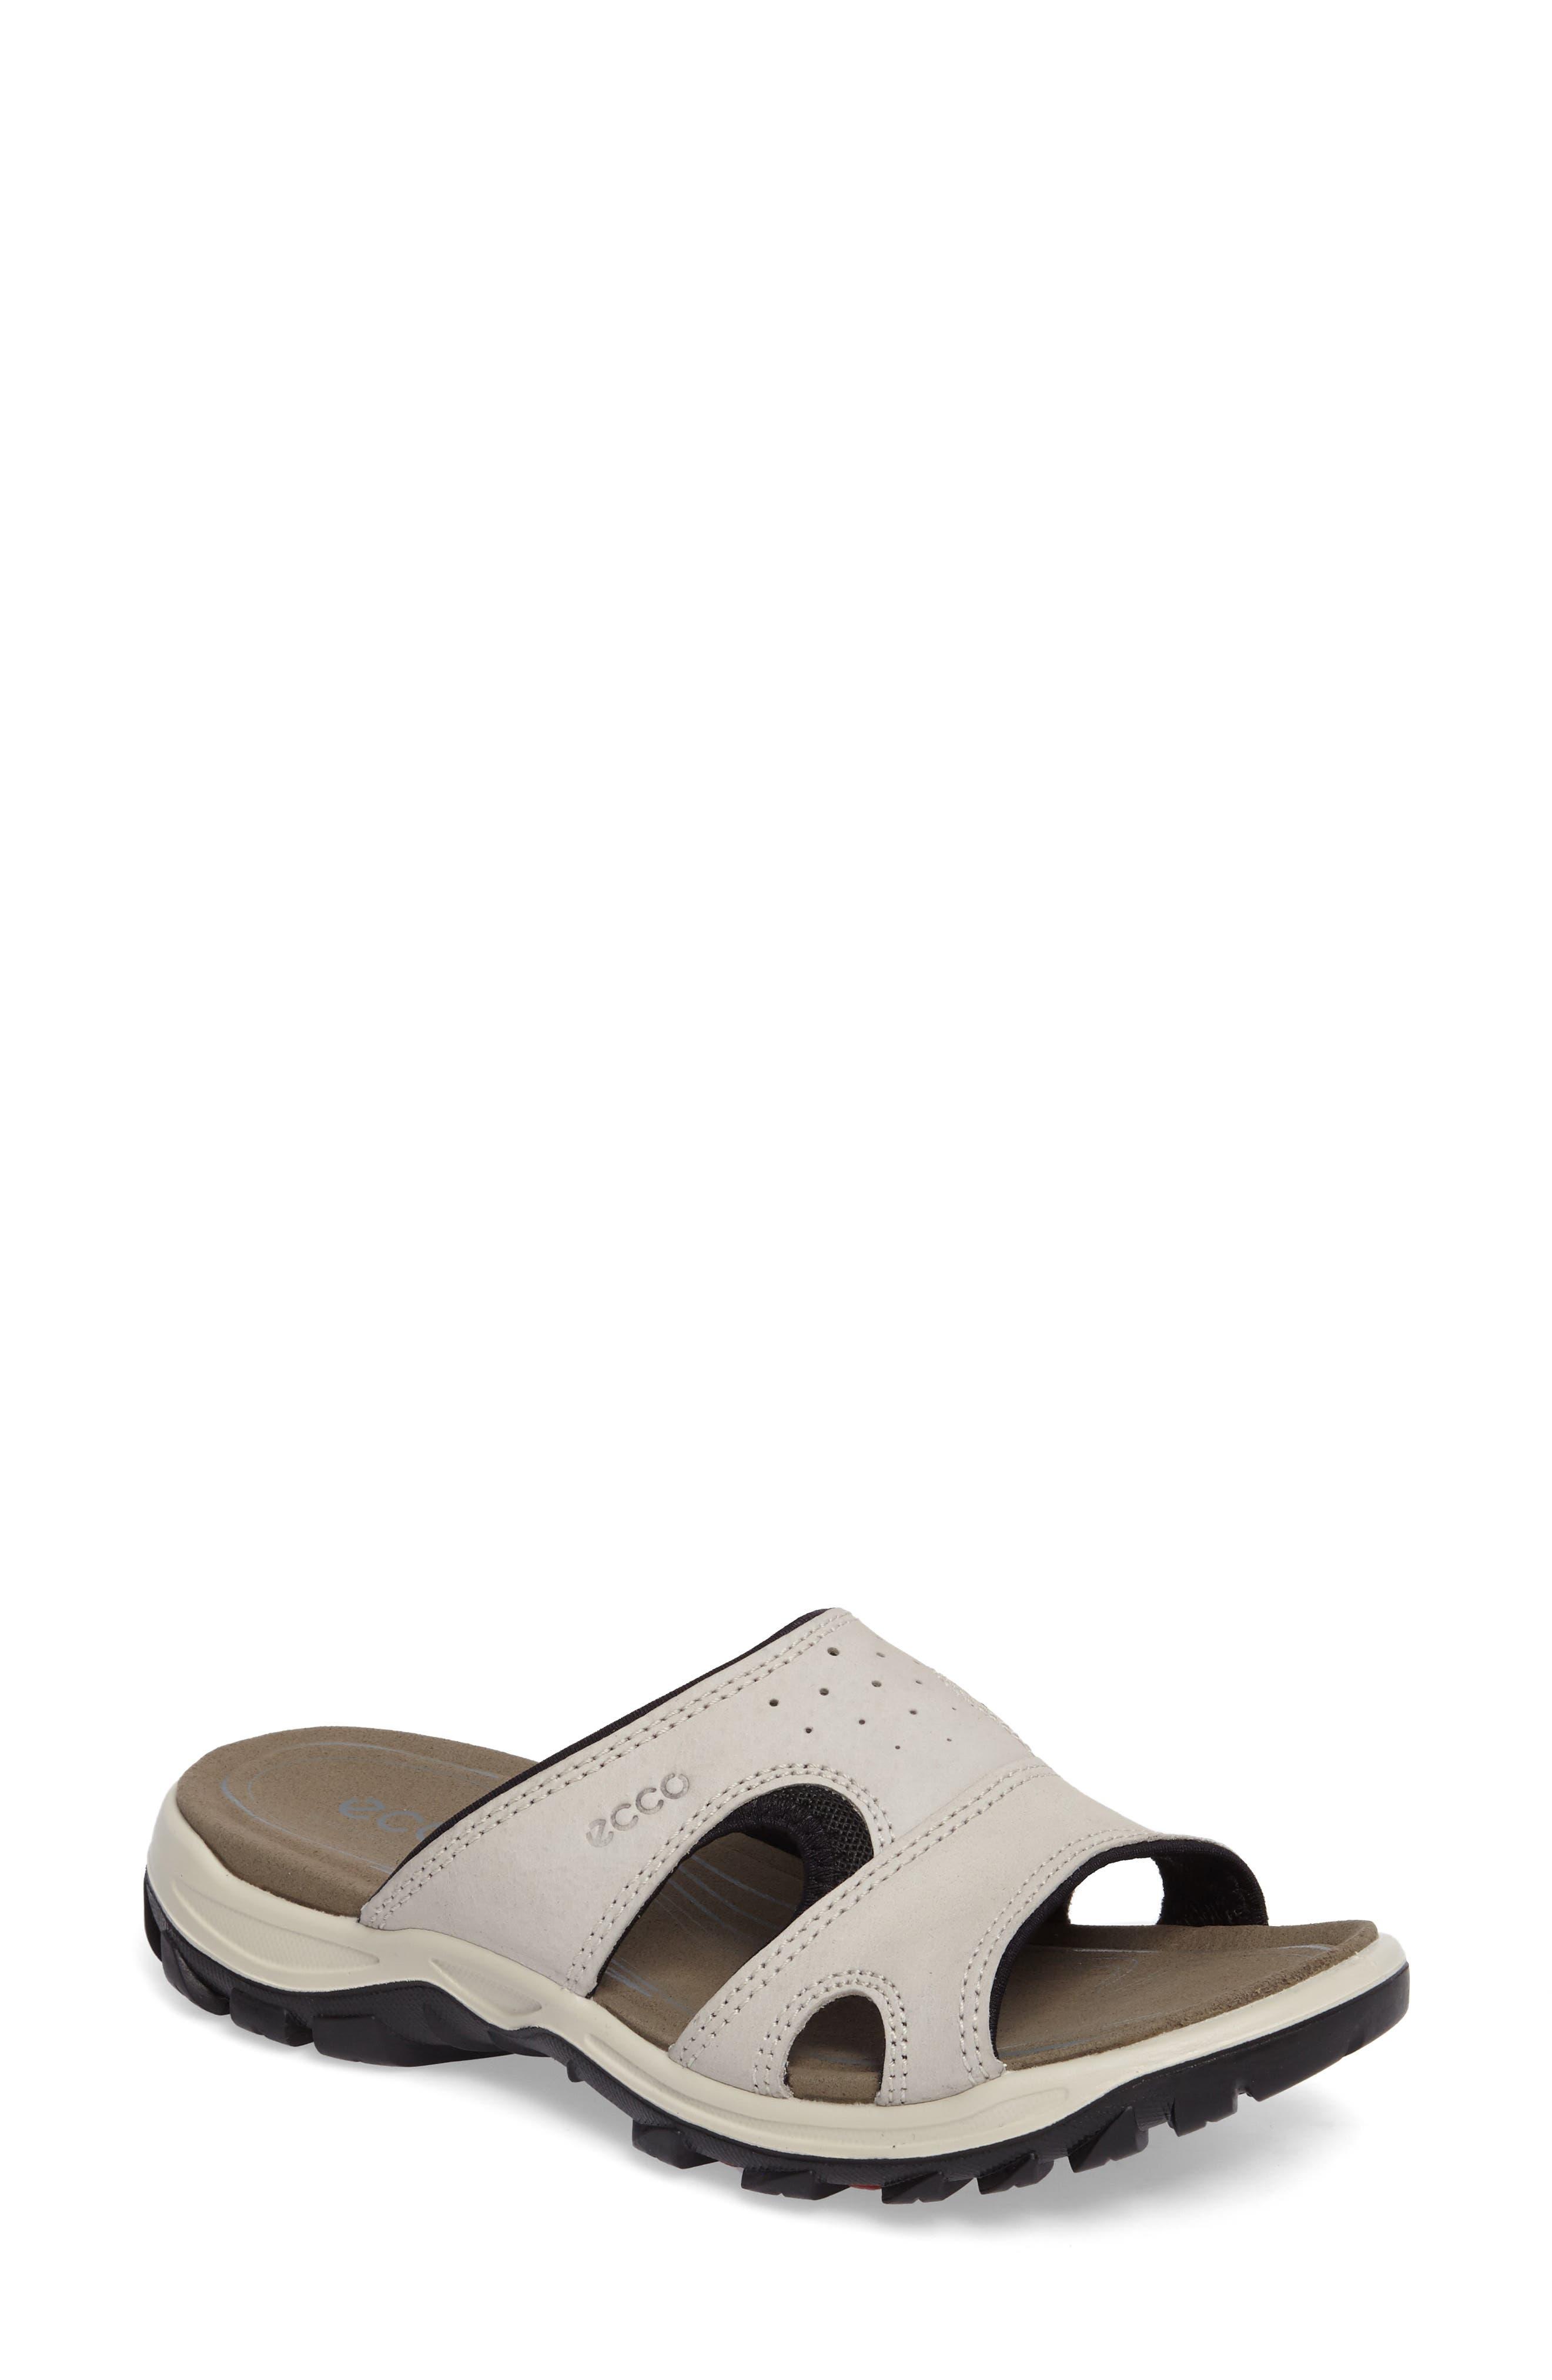 ECCO Offroad Lite Slide Sandal, Main, color, GRAVEL/ BLACK LEATHER